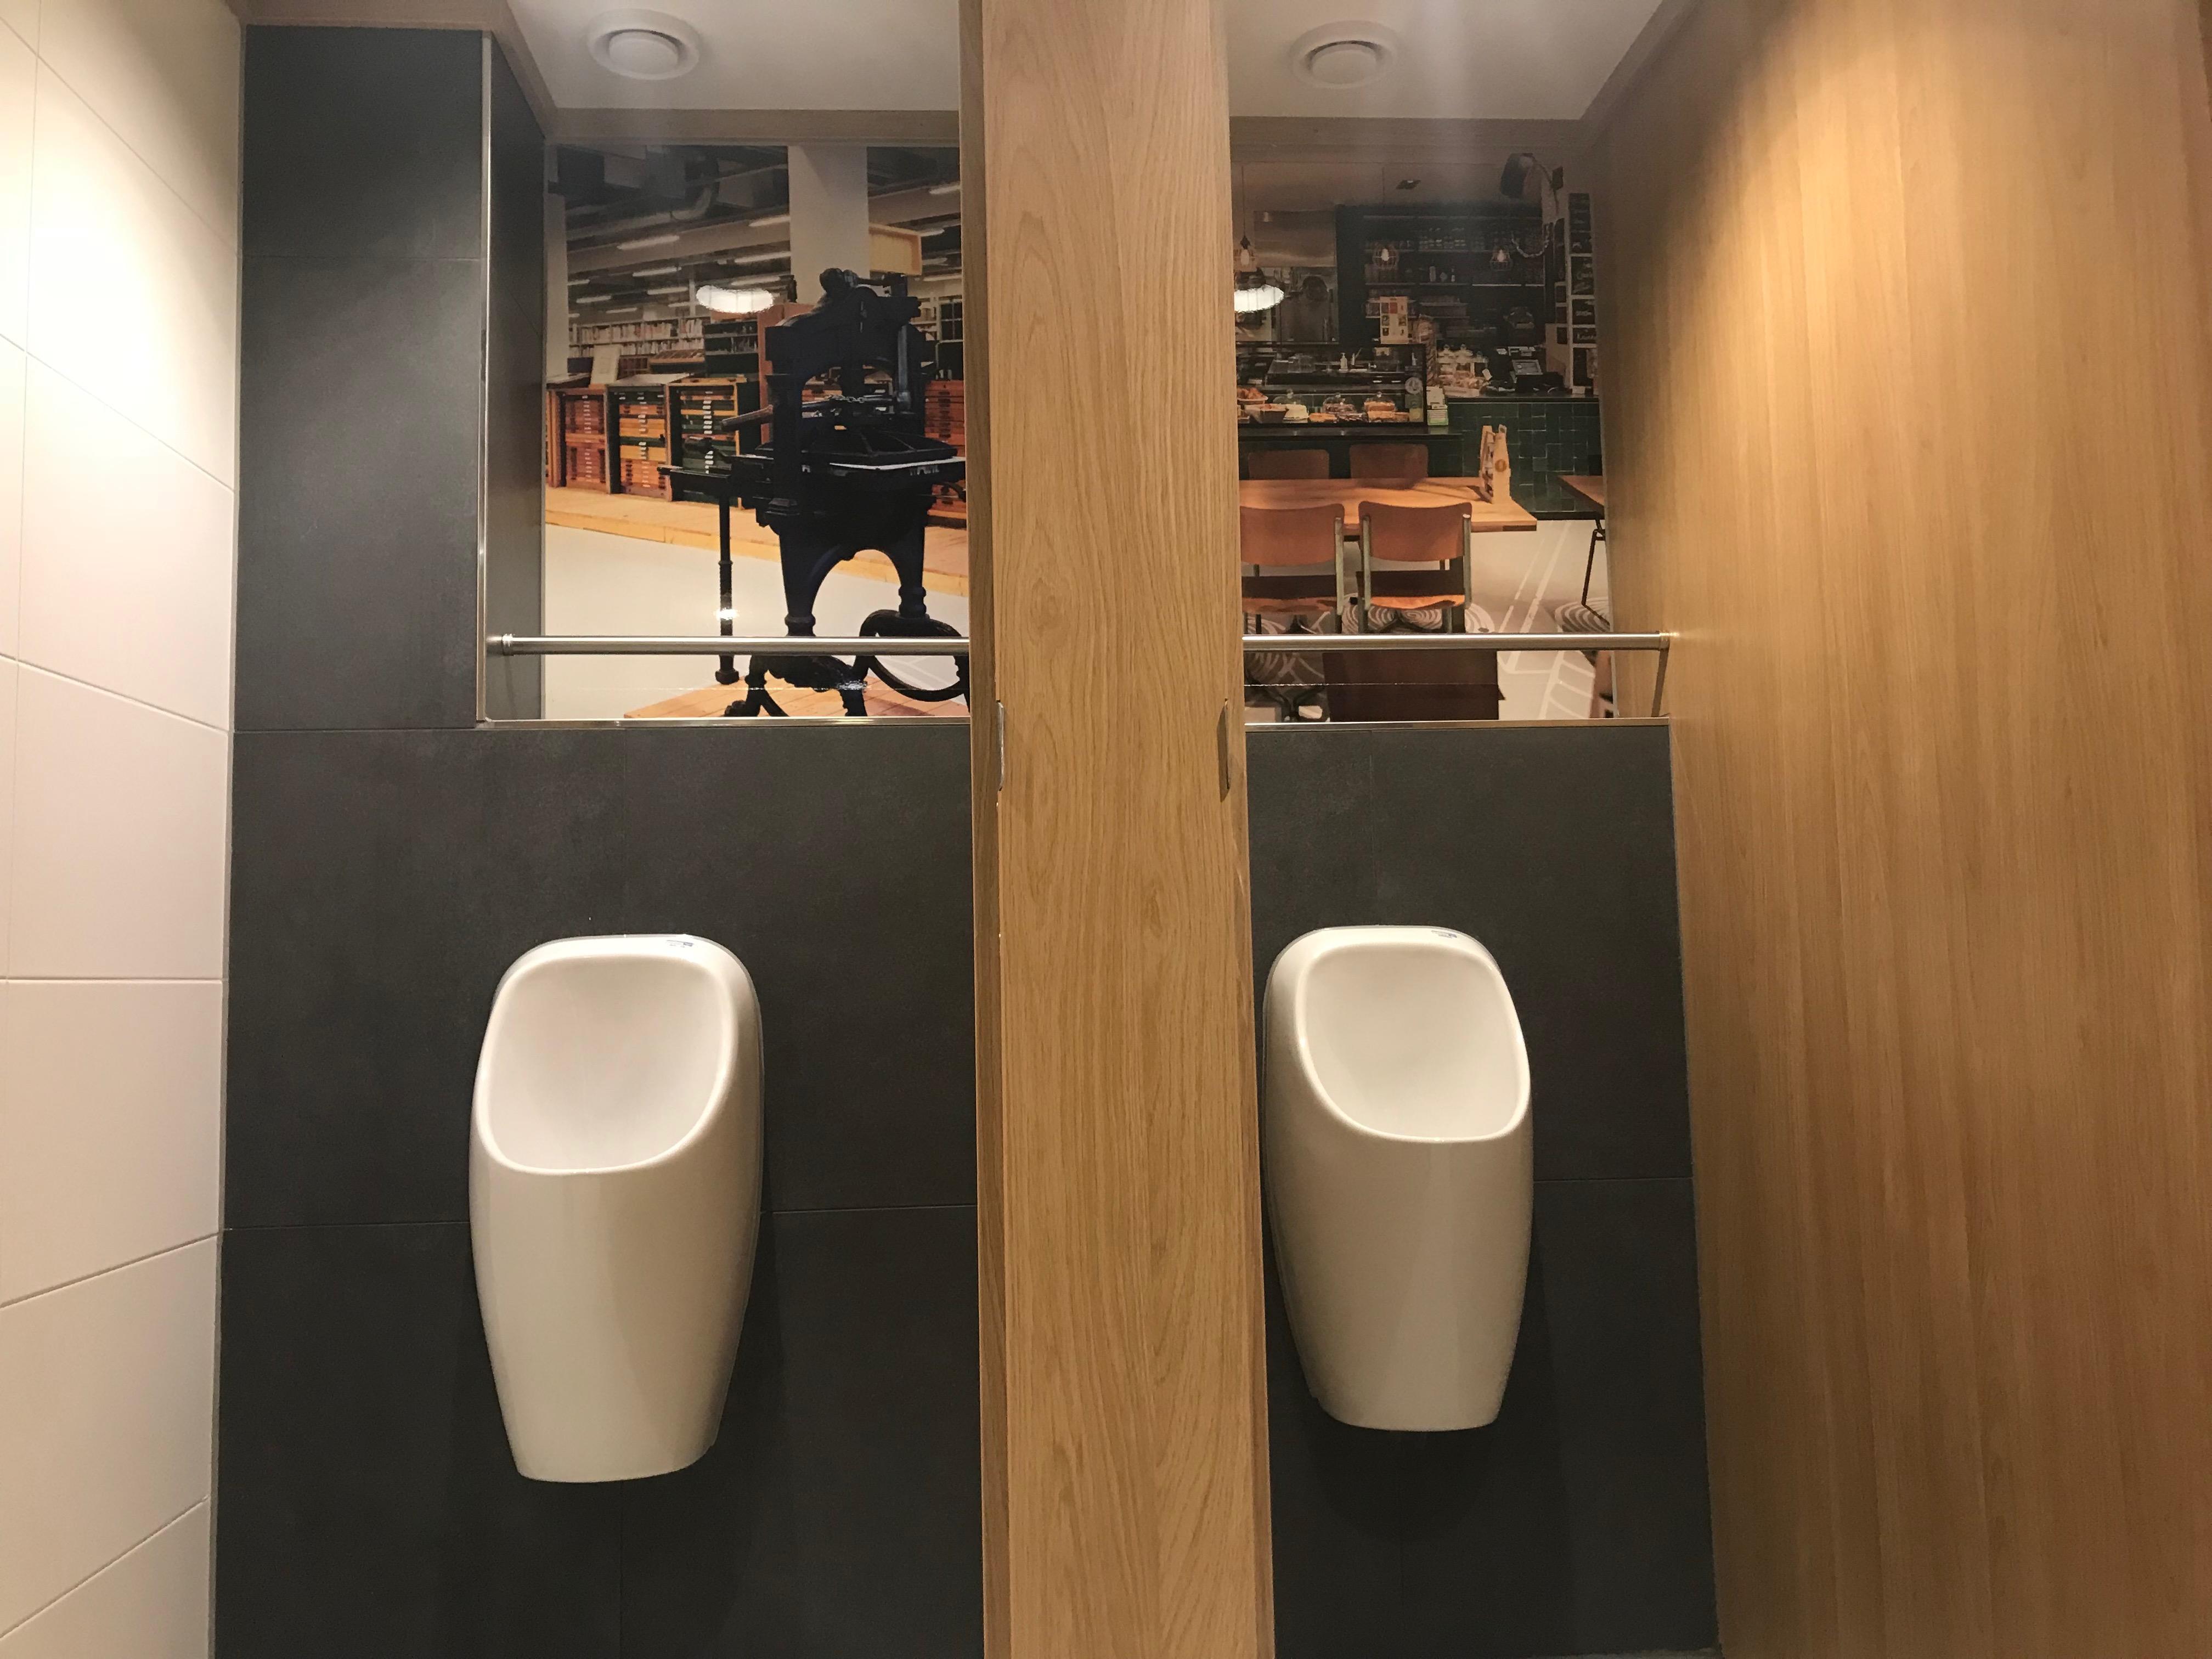 Toletto - Publieke toiletten Chocoladefabriek Gouda 4